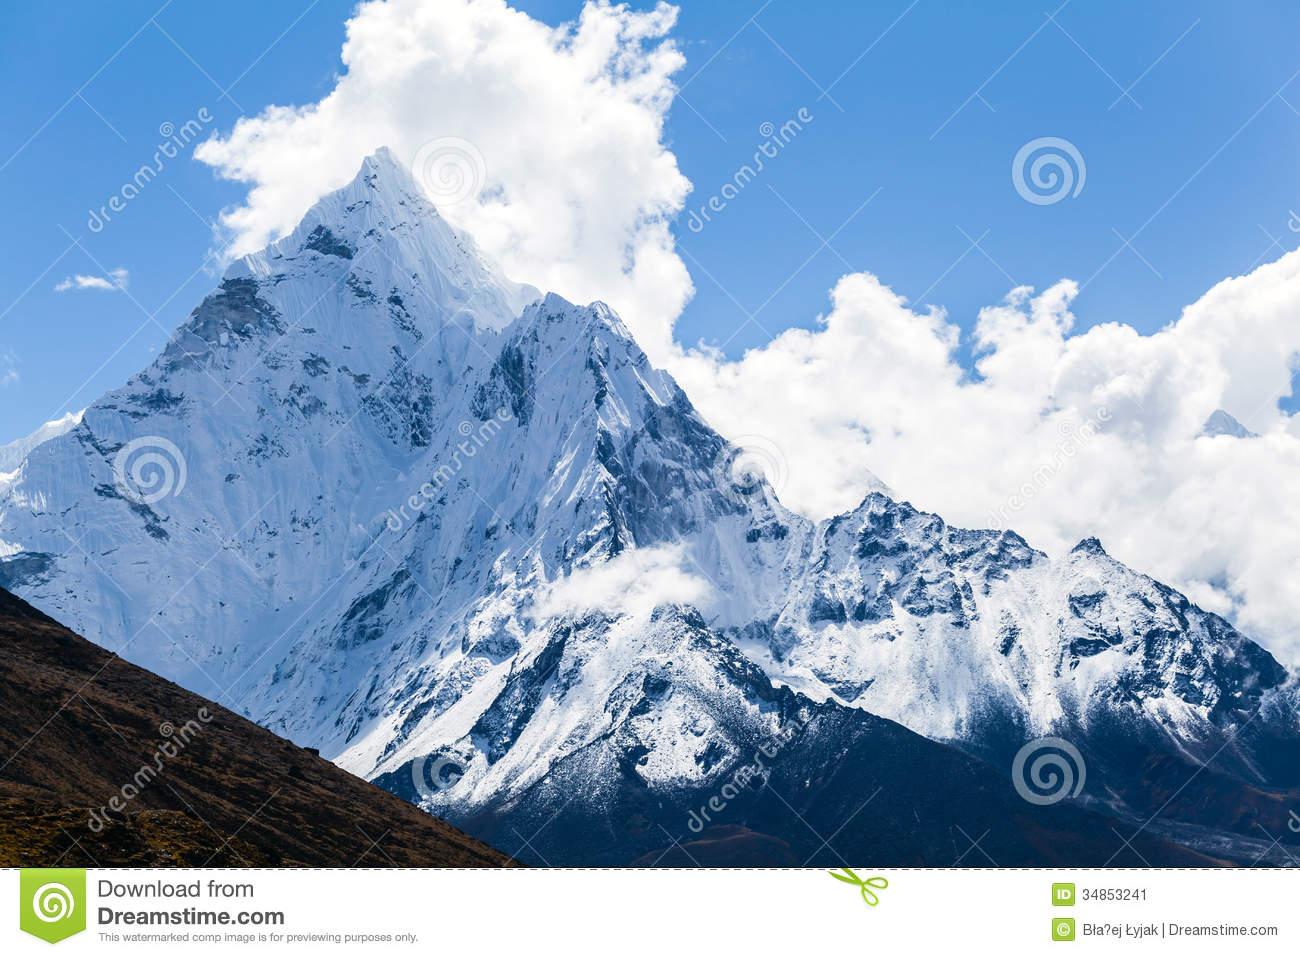 Himalaya Mountans clipart #8, Download drawings